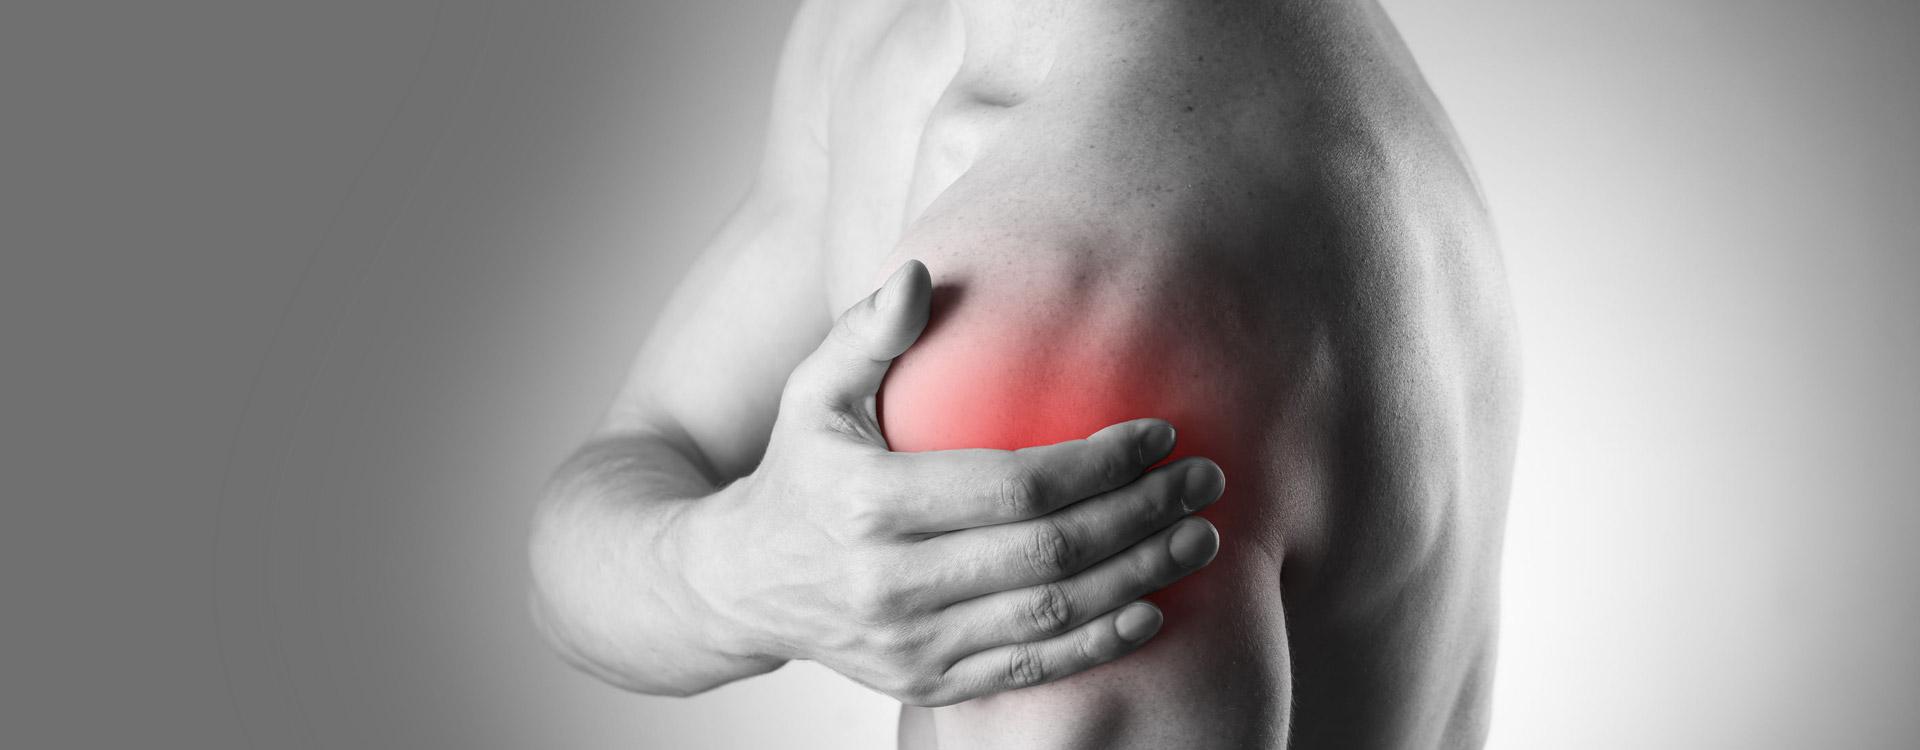 Как лечить острый артроз плечевого сустава